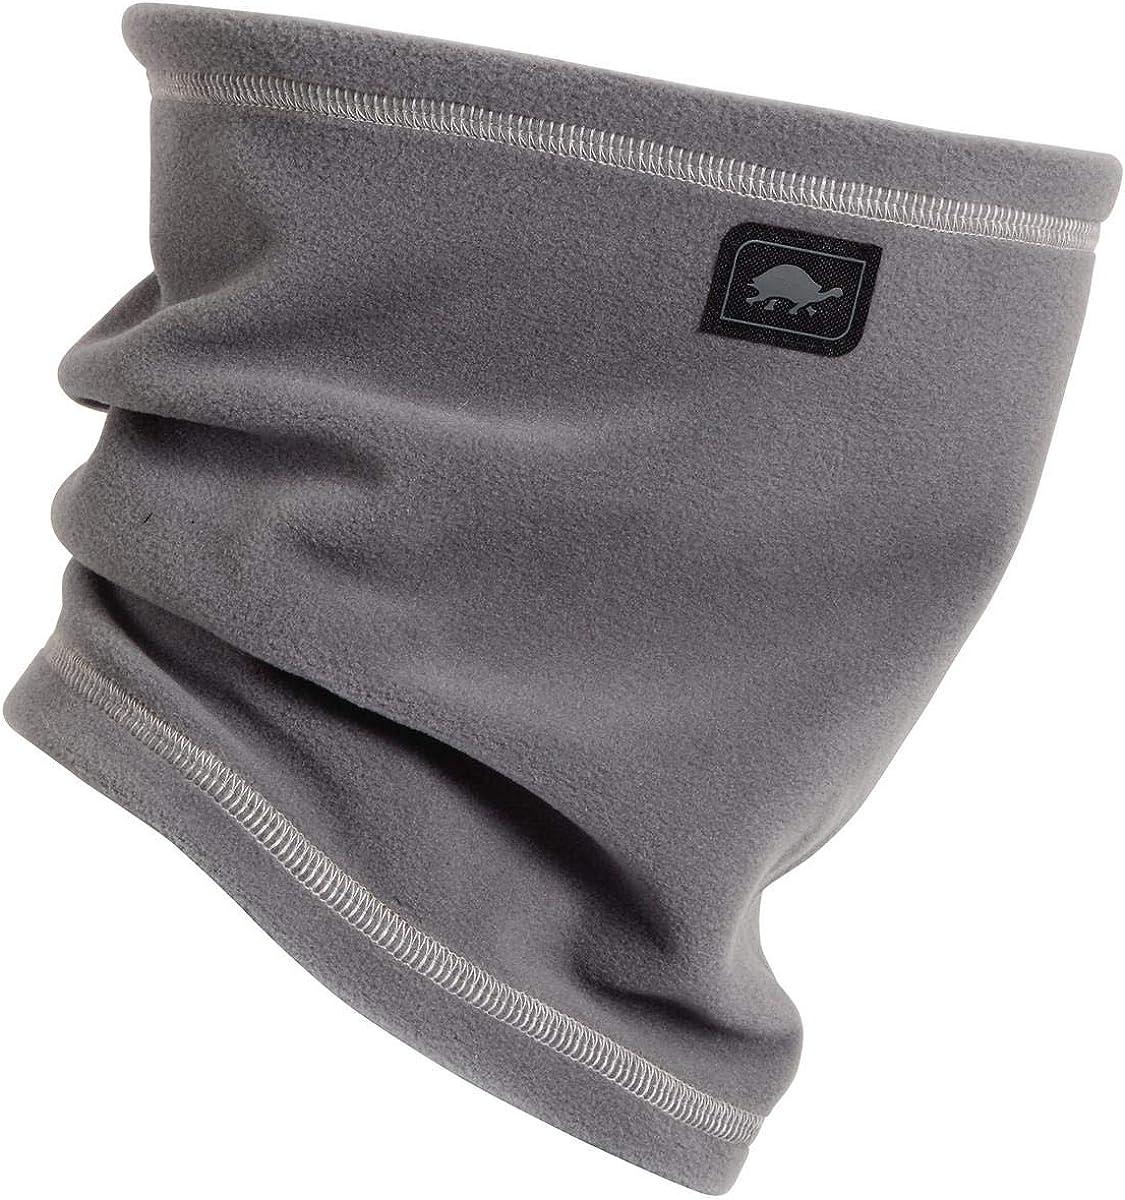 Turtle Fur - Single-Layer Lightweight Micro Fur Fleece Neck Warmer